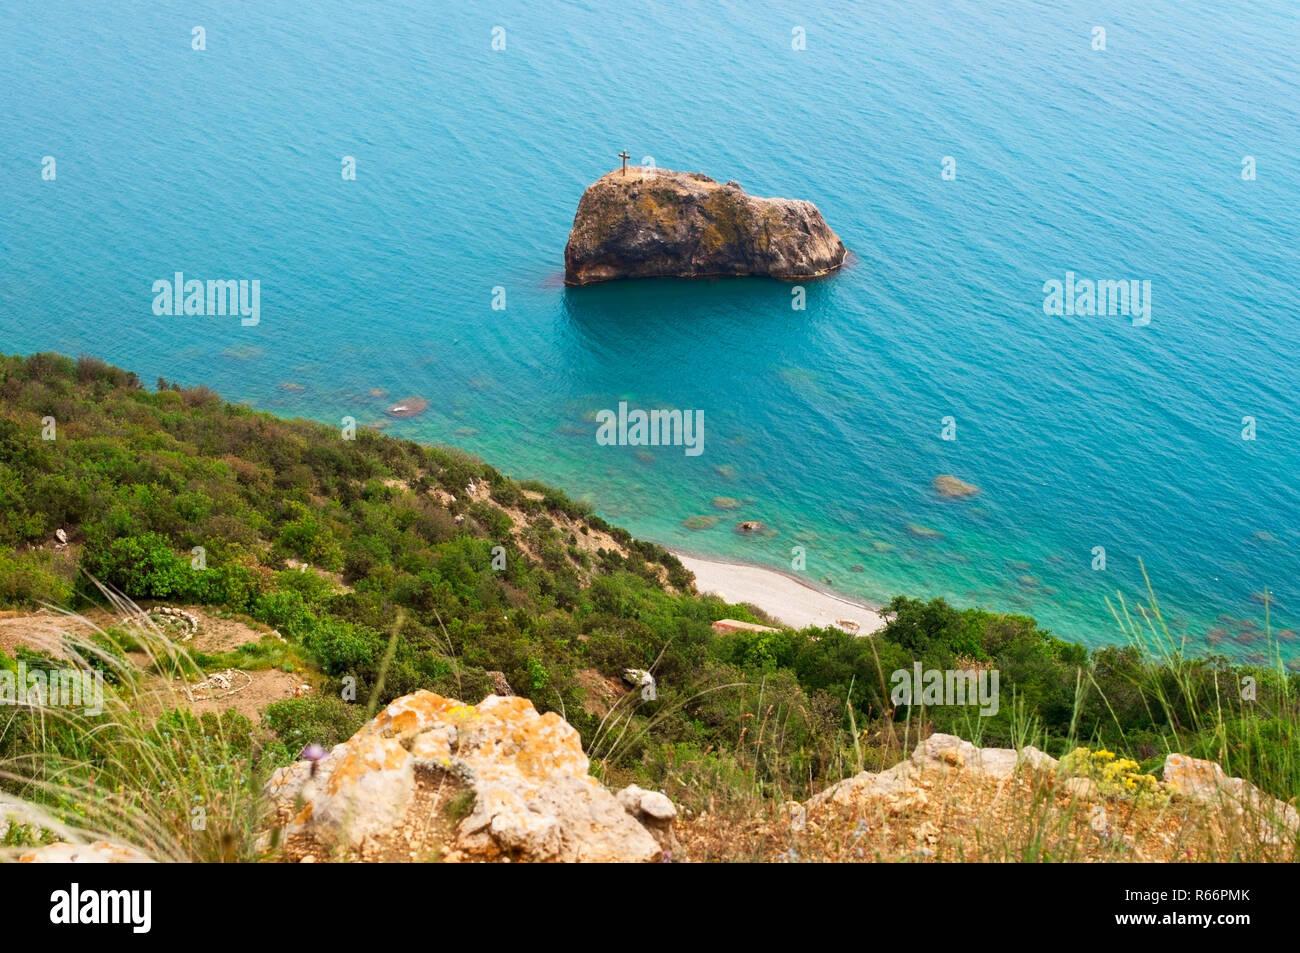 Cape St George Island Stock Photos & Cape St George Island Stock